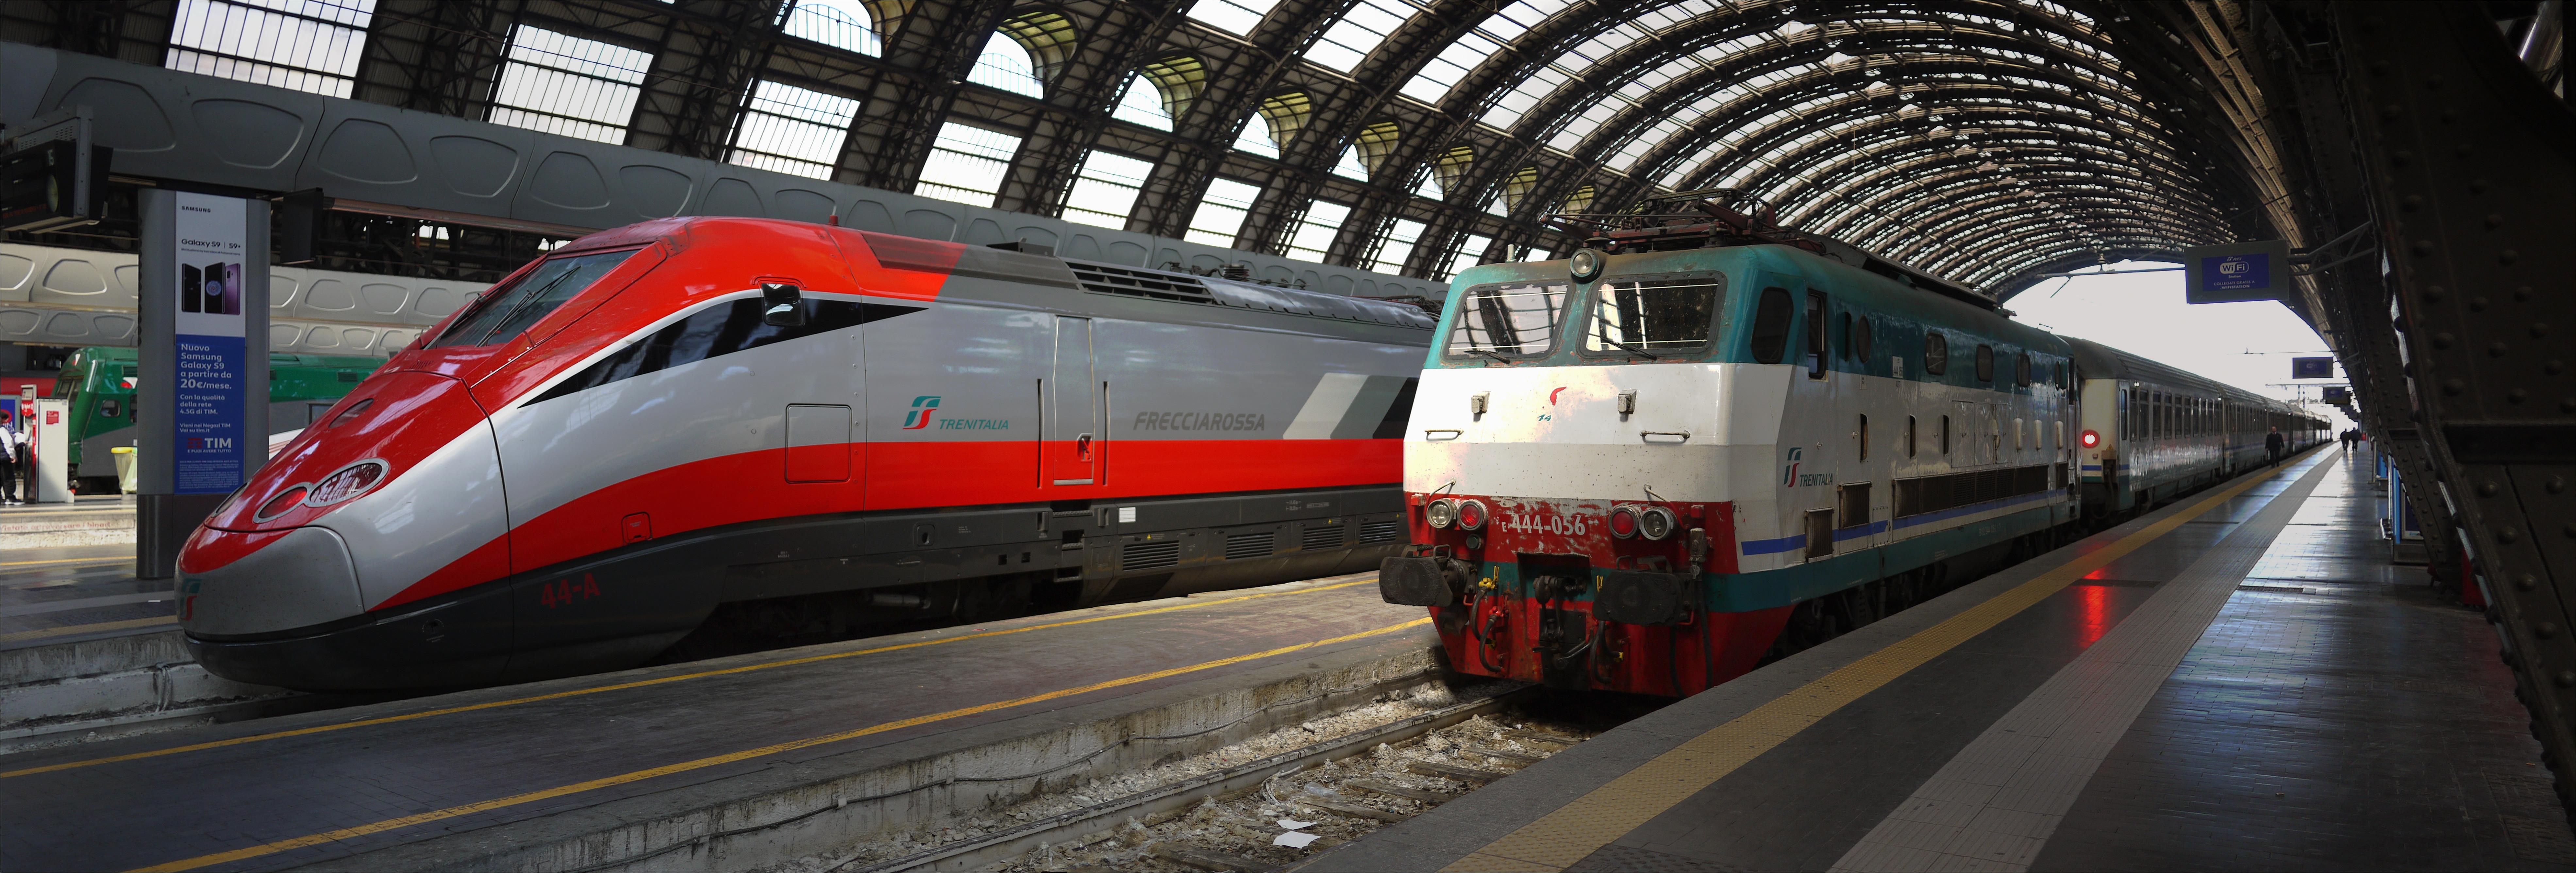 rail transport in italy wikipedia